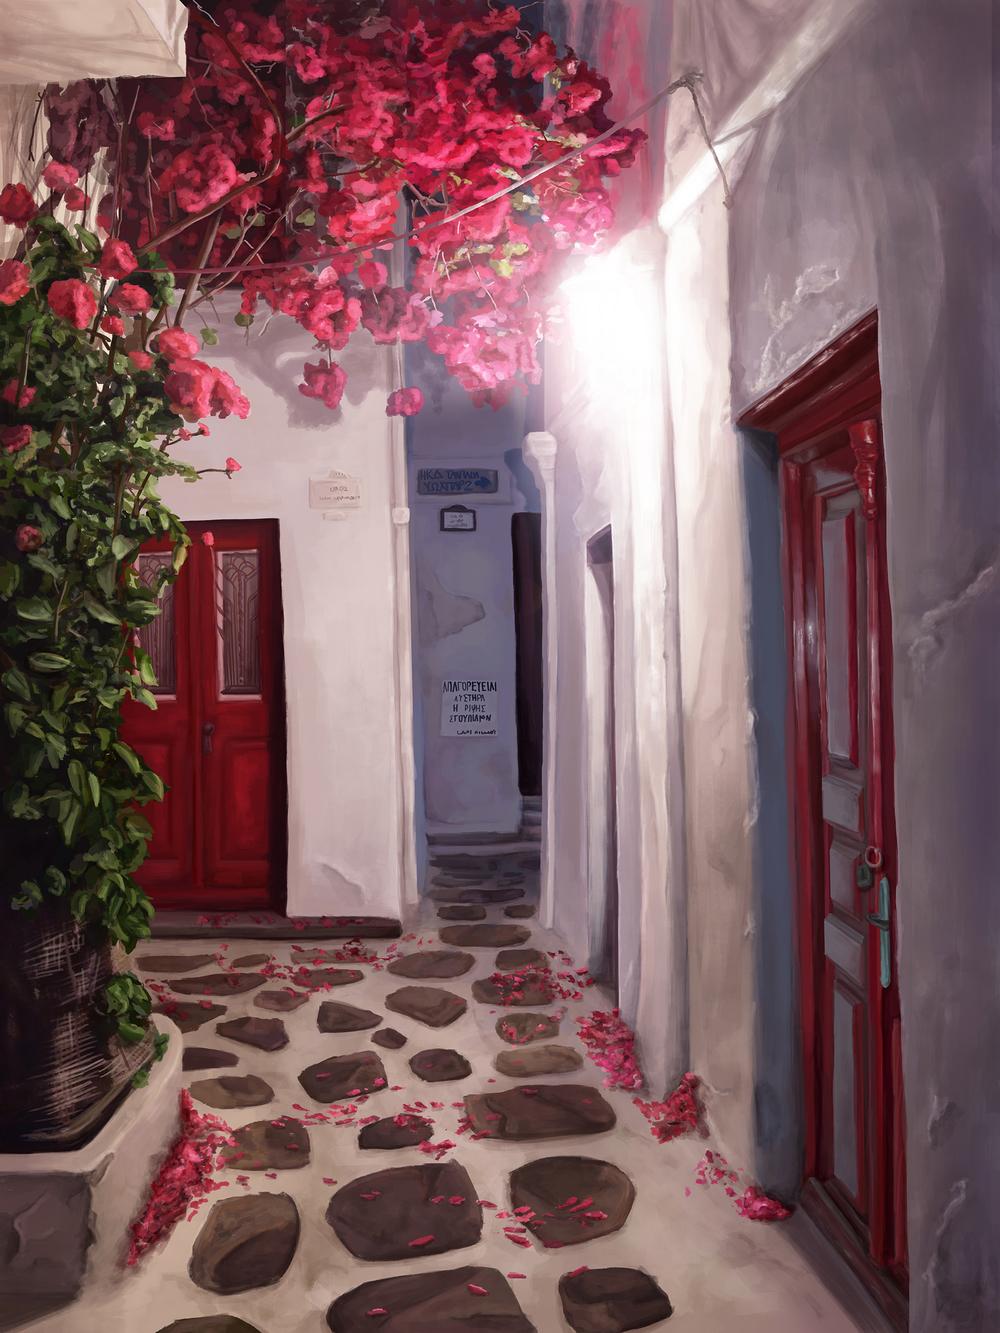 Mykonos-Street-7-16.jpg